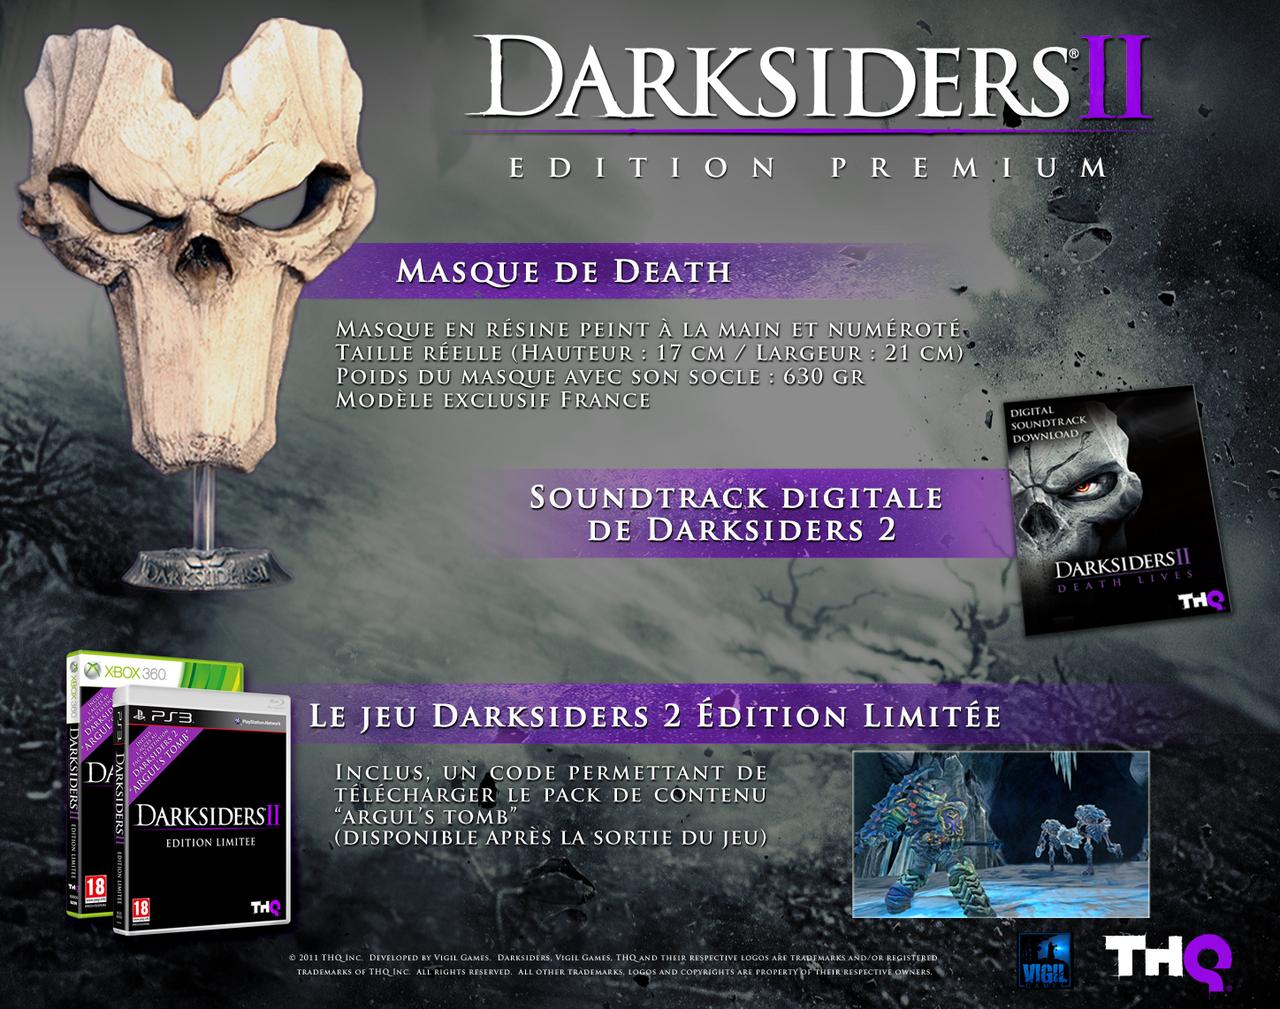 Darksiders 2 Edition premium sur PS3